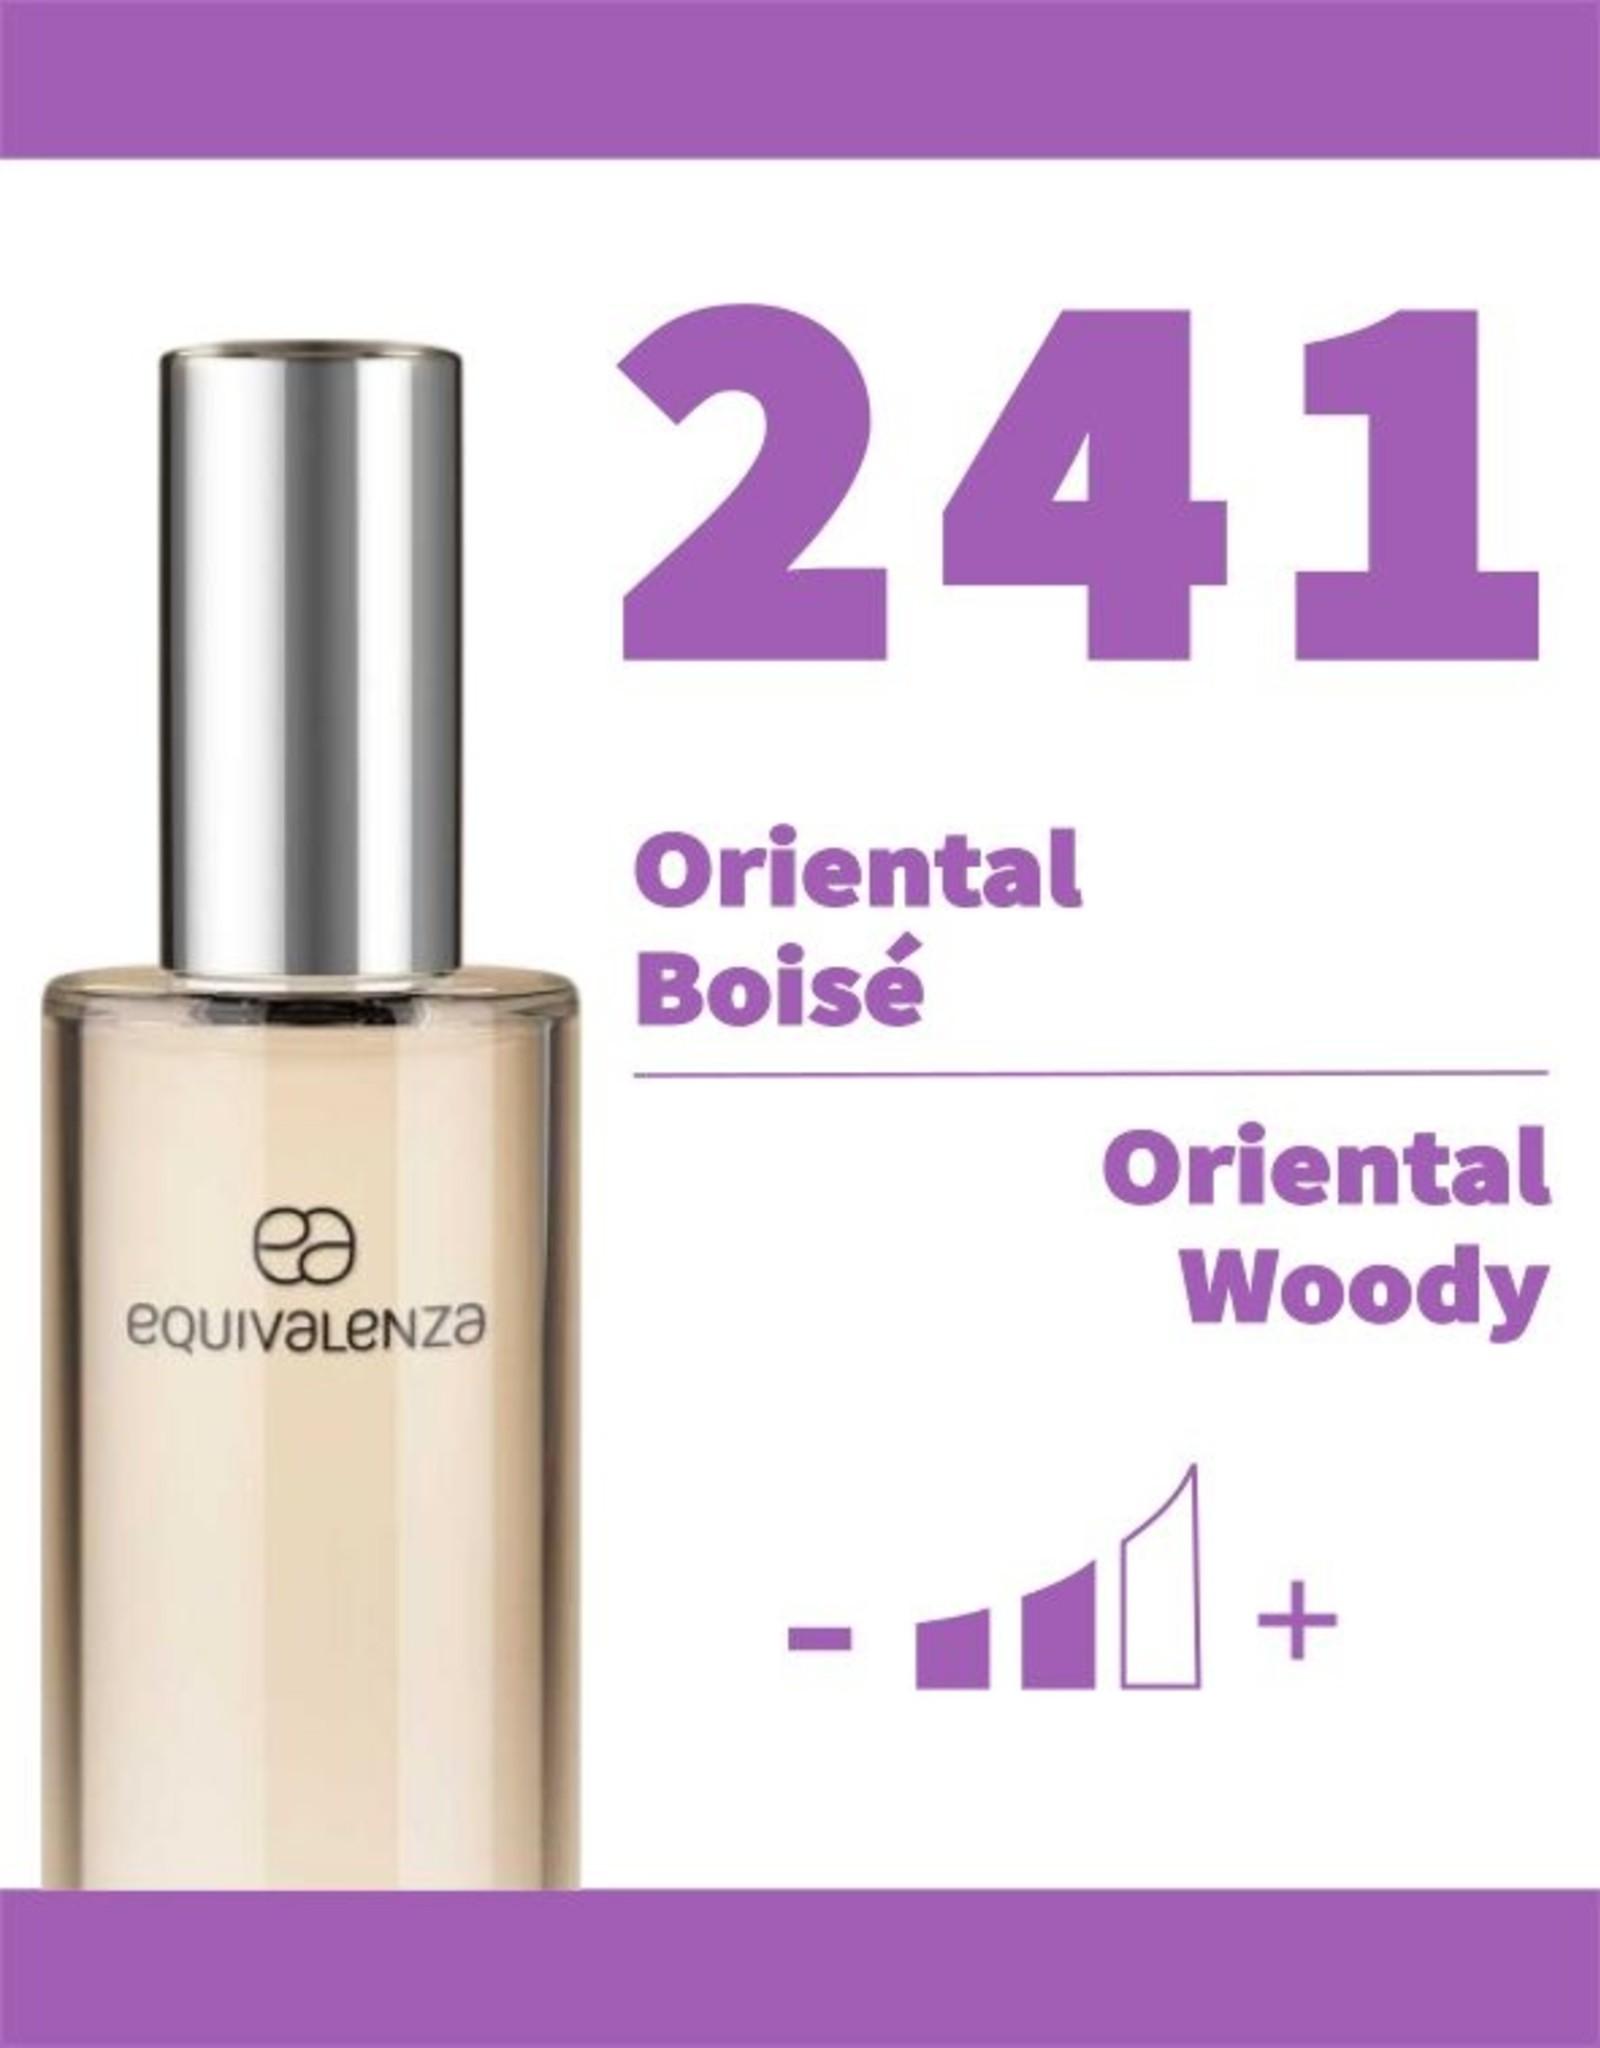 Equivalenza Oriental Woody 241